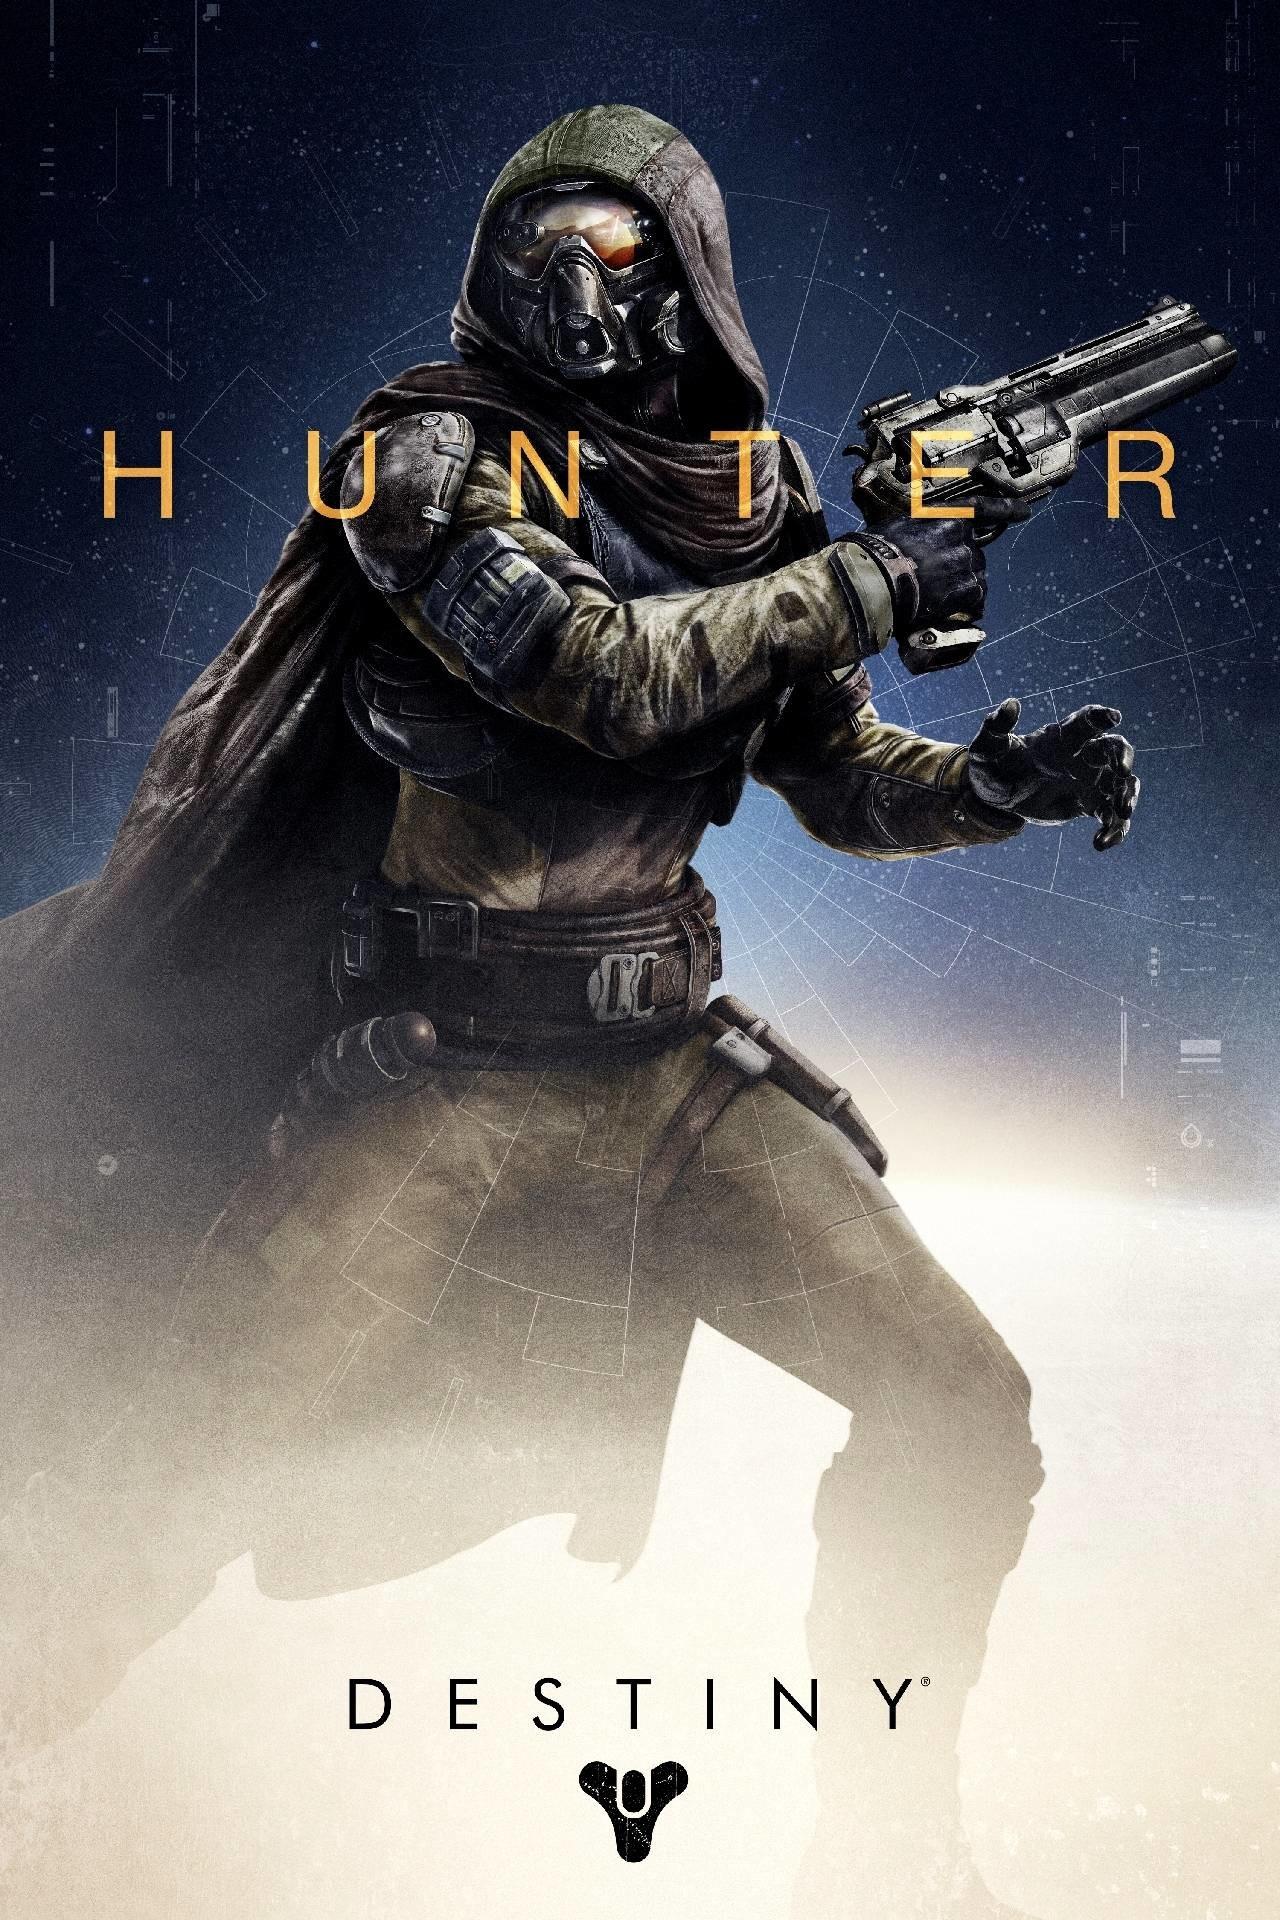 Hunter And Warlock   Data-src - Hunter Destiny 2 Wallpaper Phone - HD Wallpaper